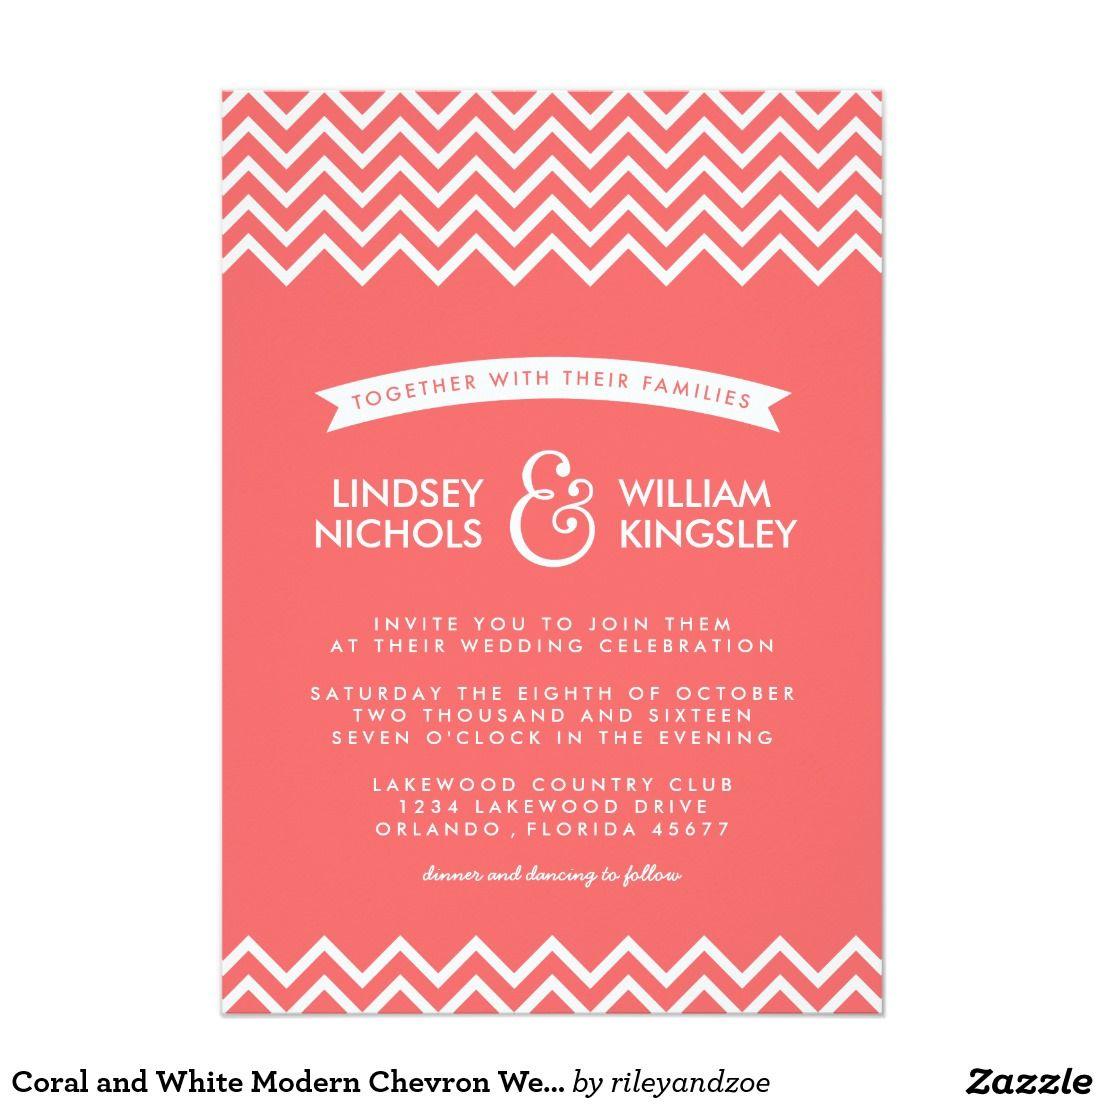 Coral and White Modern Chevron Wedding Invitation | Pinterest ...